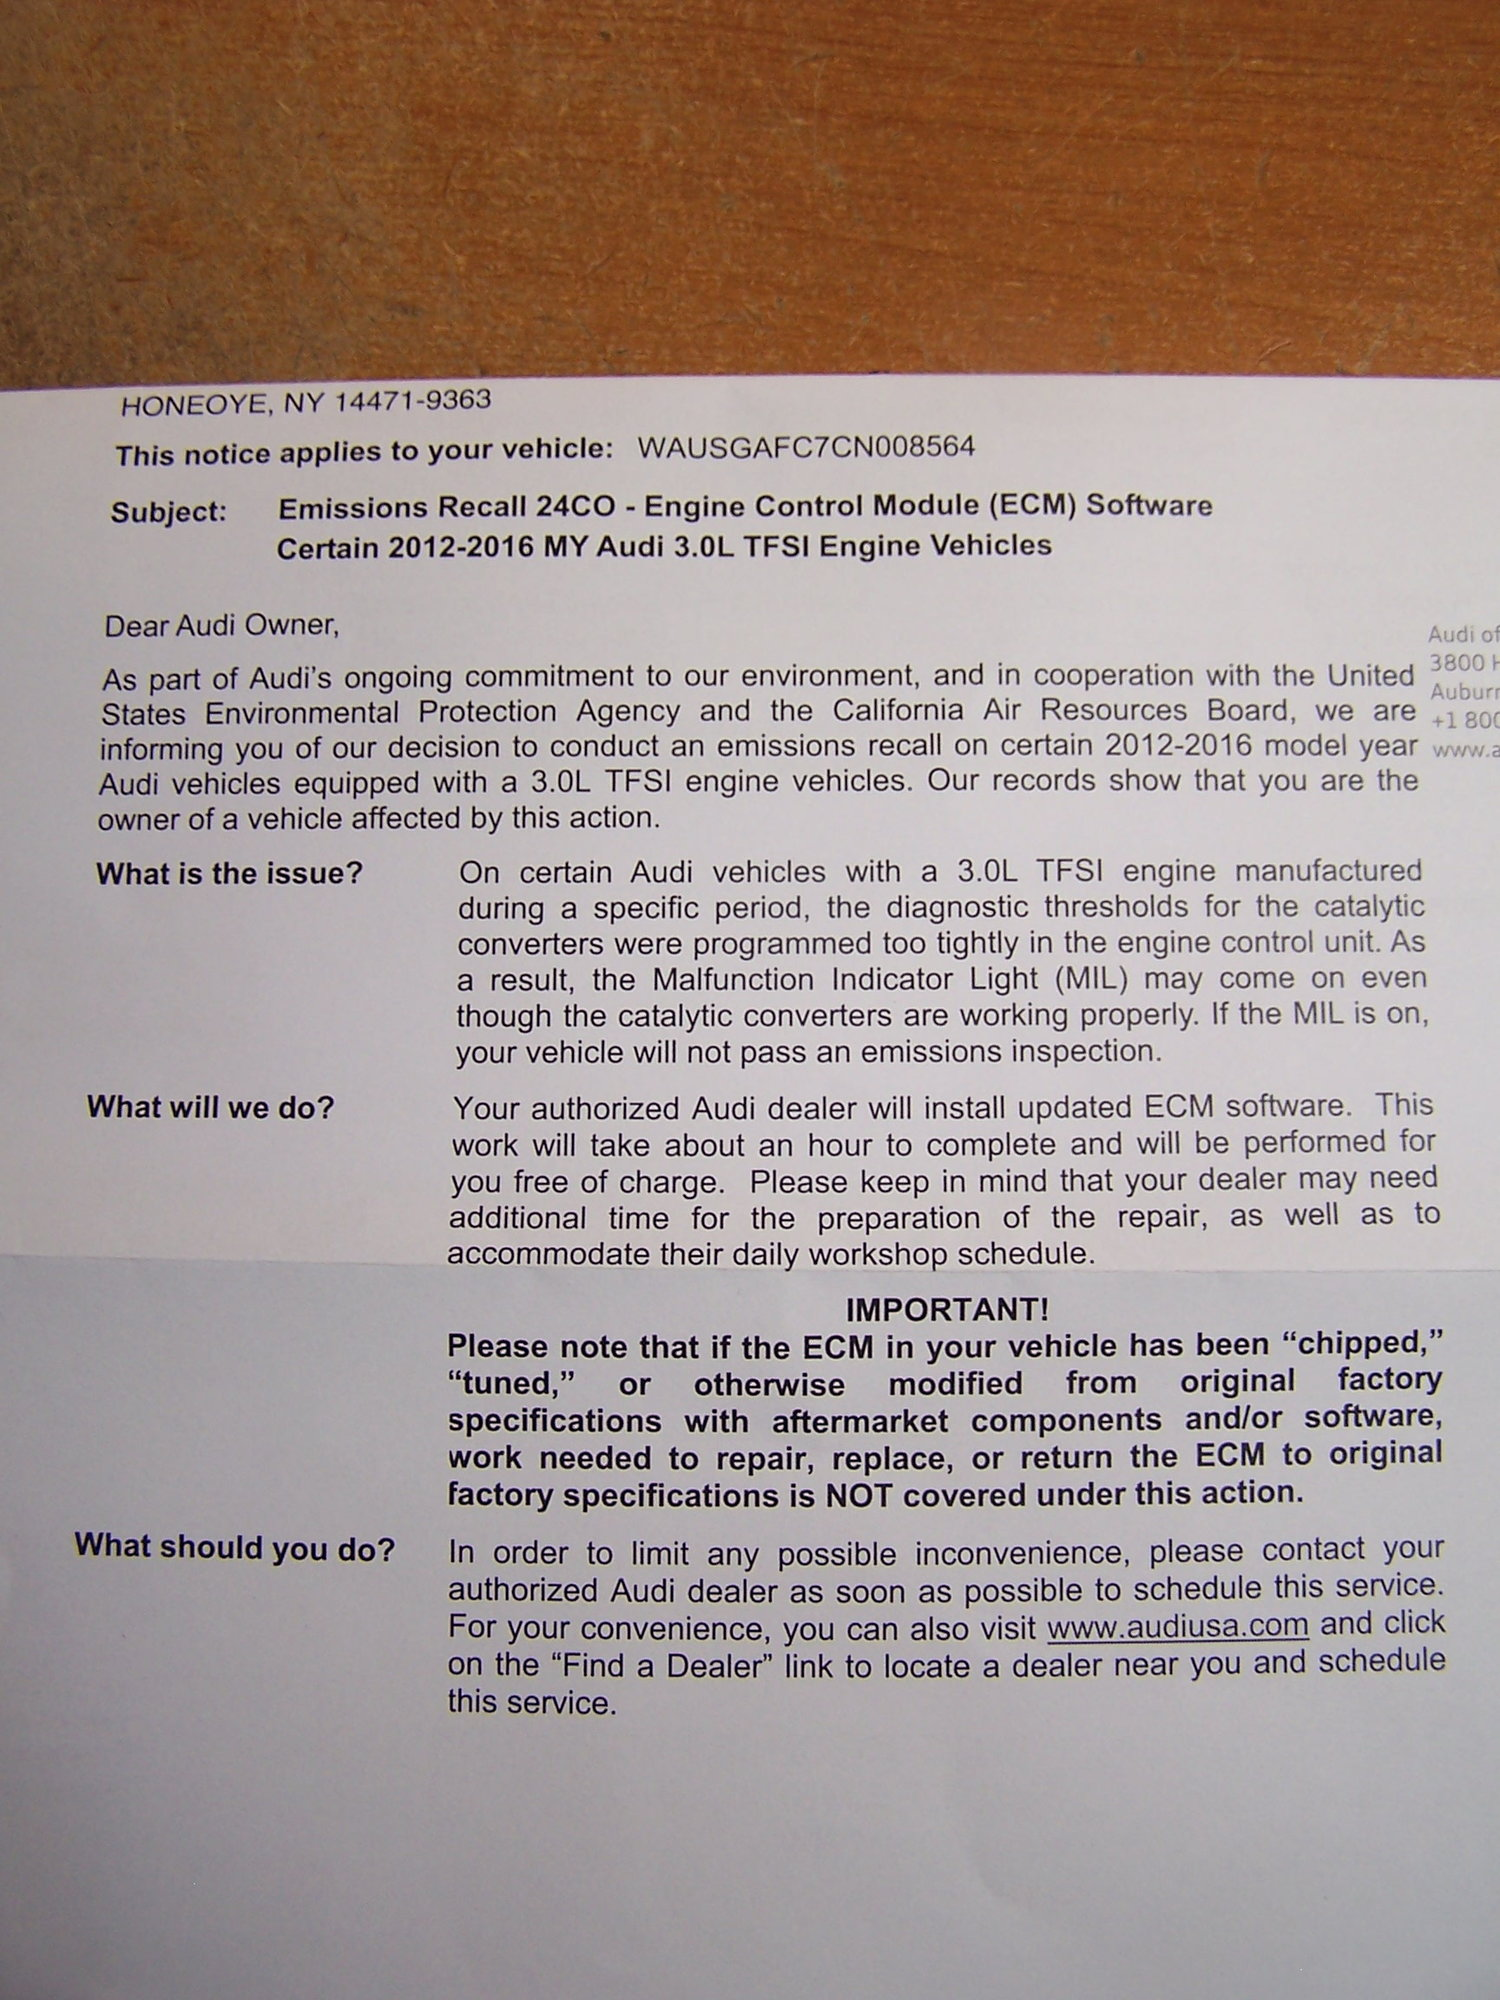 Emissions Recall Notice - ECM Software - AudiWorld Forums